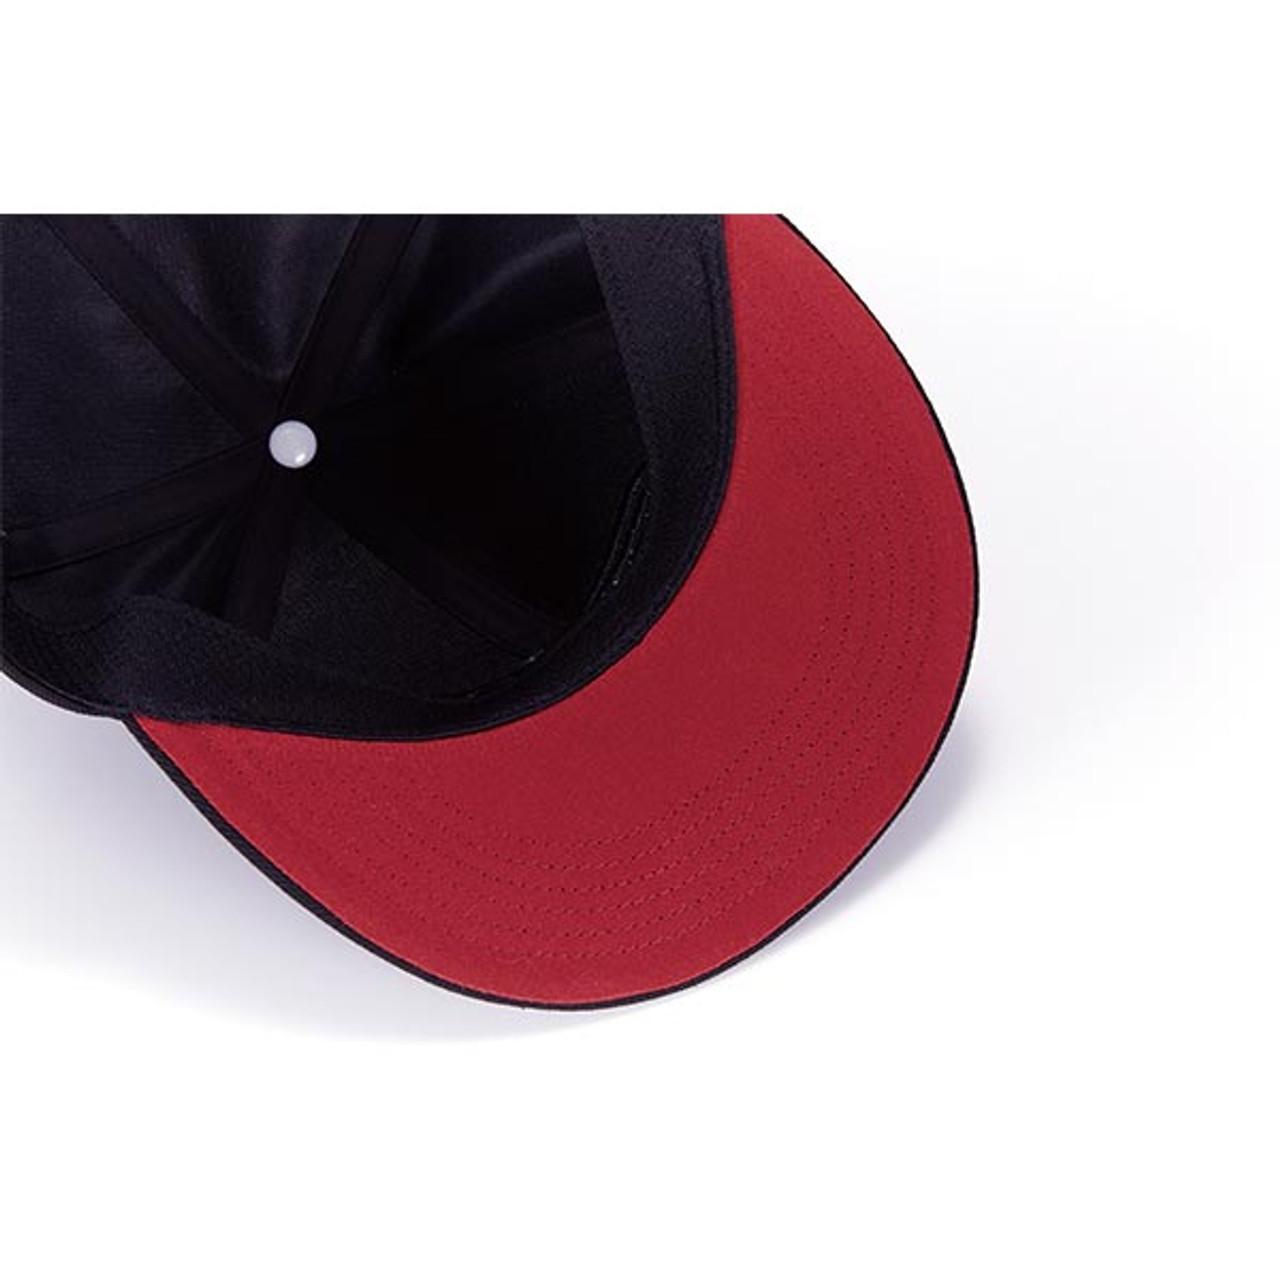 STI Flat Cap STSG18100420 under visor front at AVOJDM.com